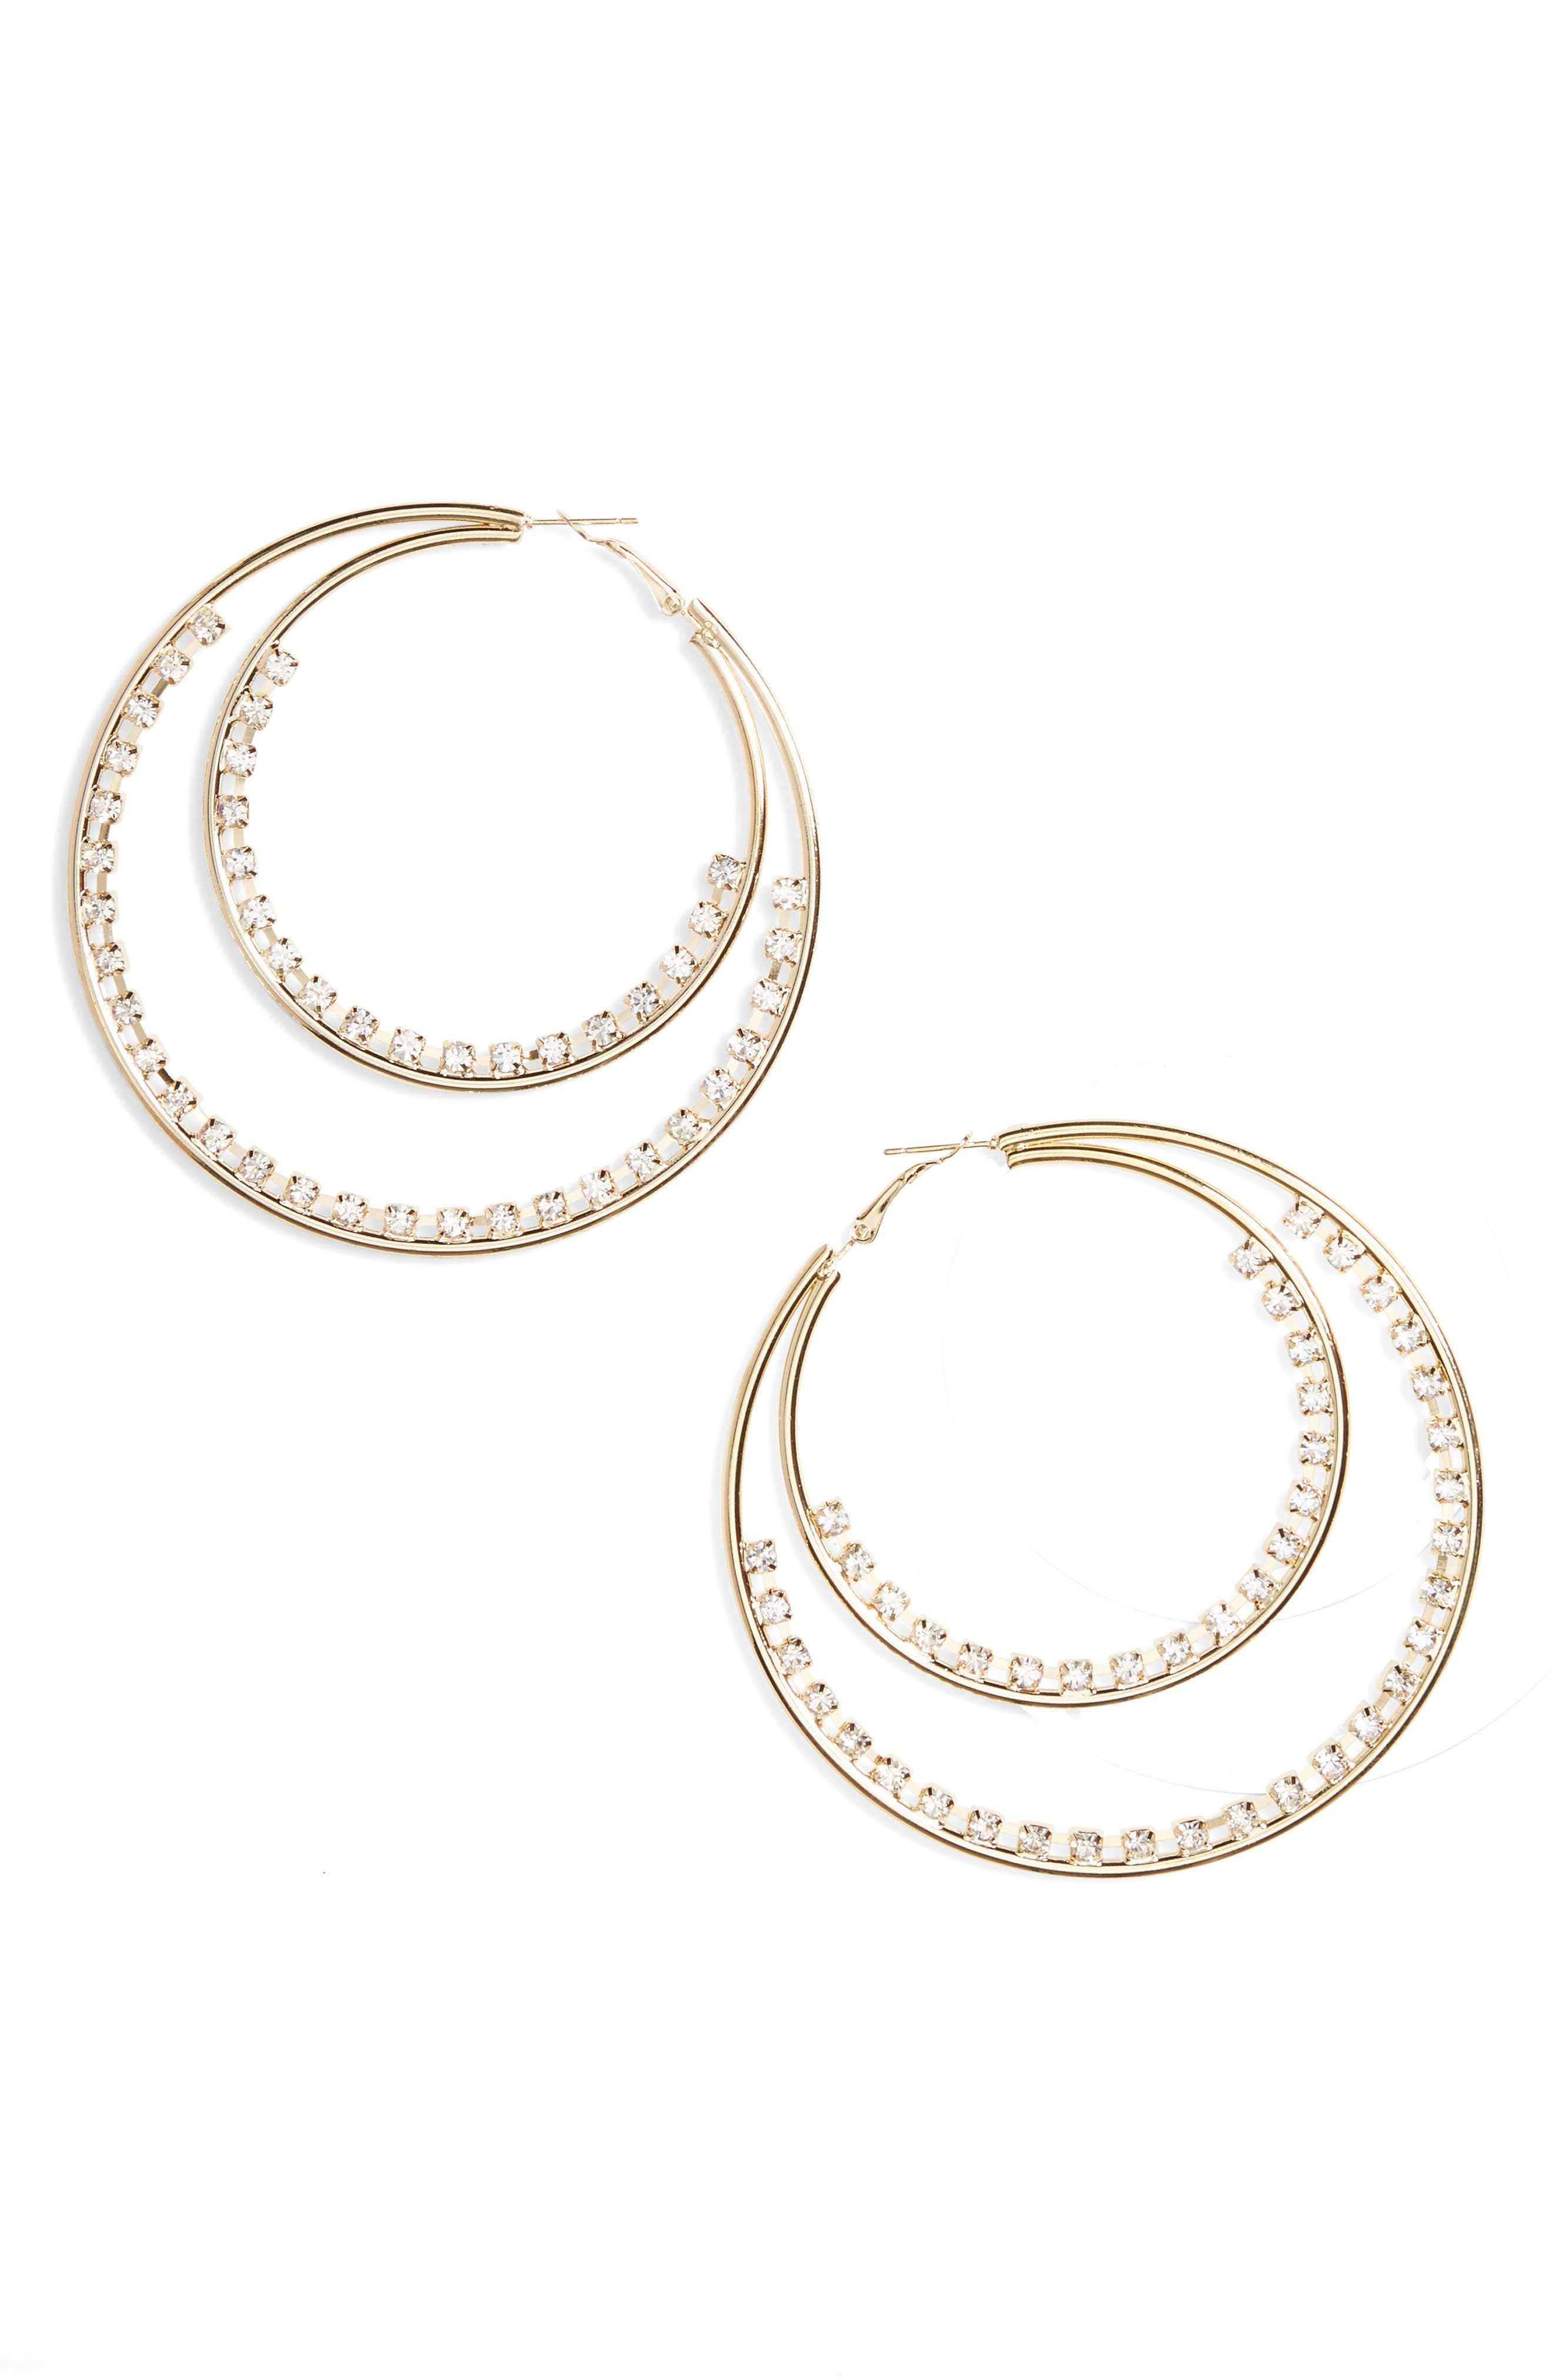 Natasha Row Crystal Double Hoop Earrings